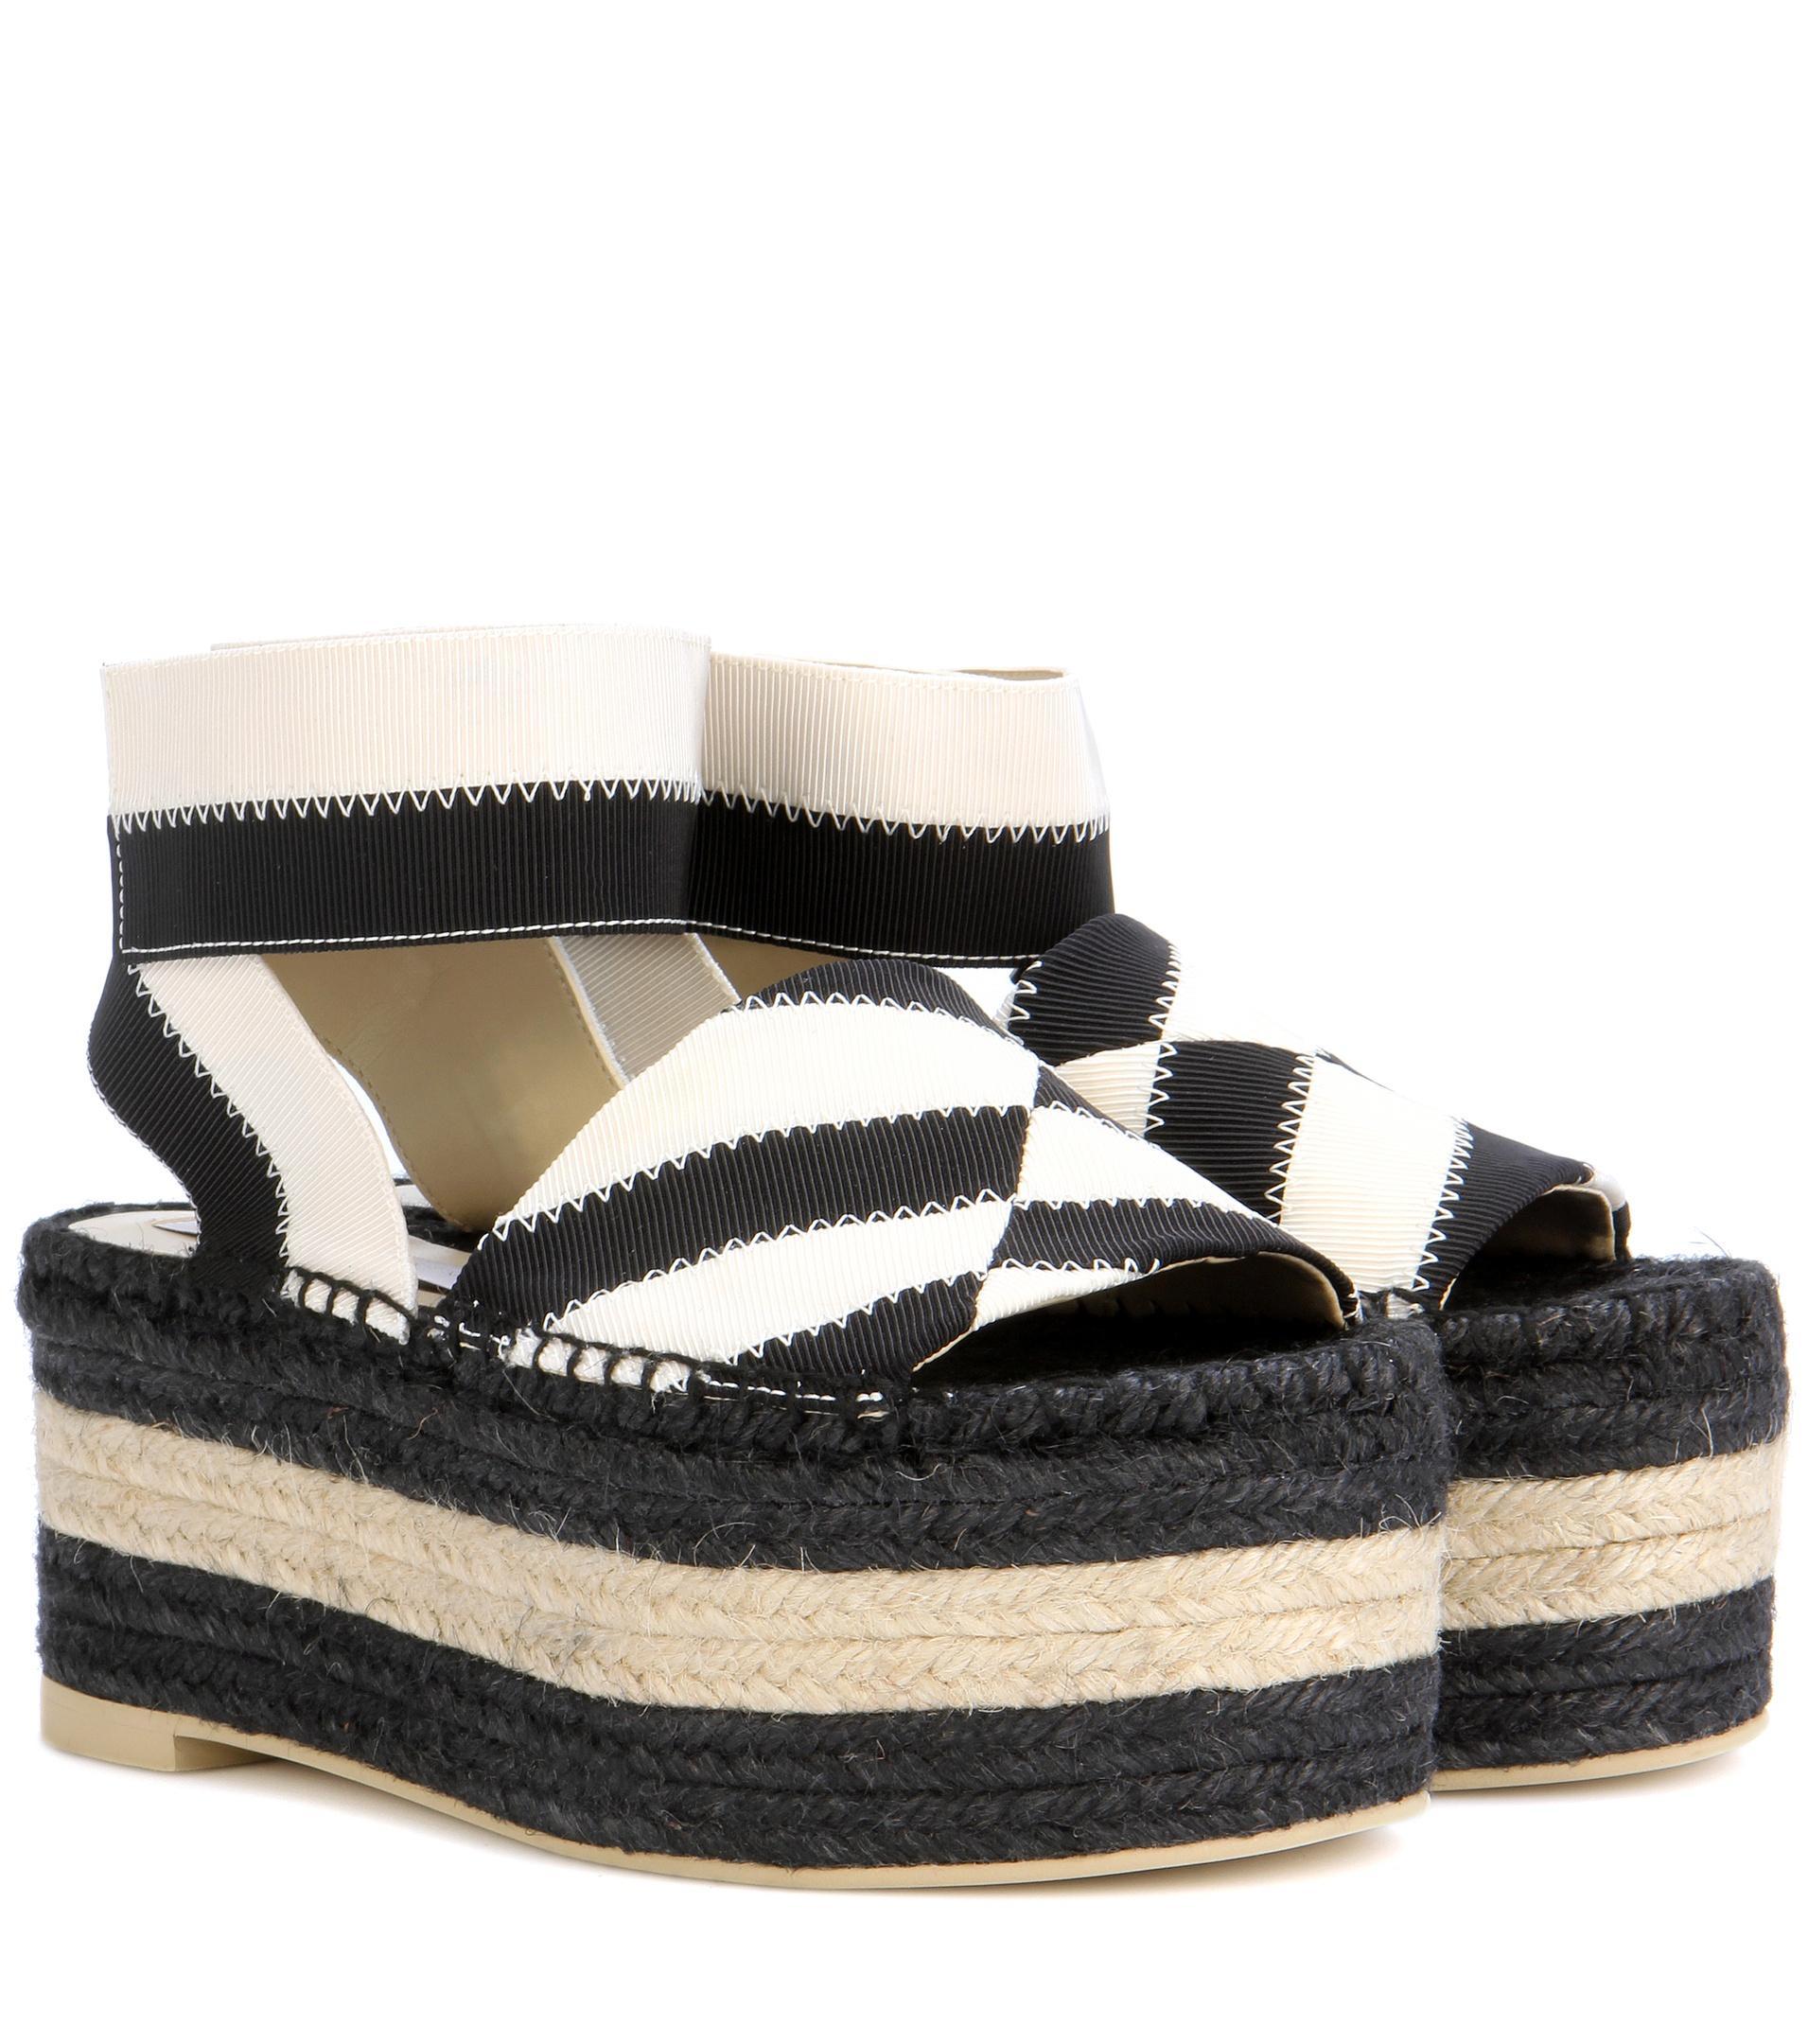 c3c1dc6966a https   www.lyst.com shoes stella-mccartney-striped-espadrille ...